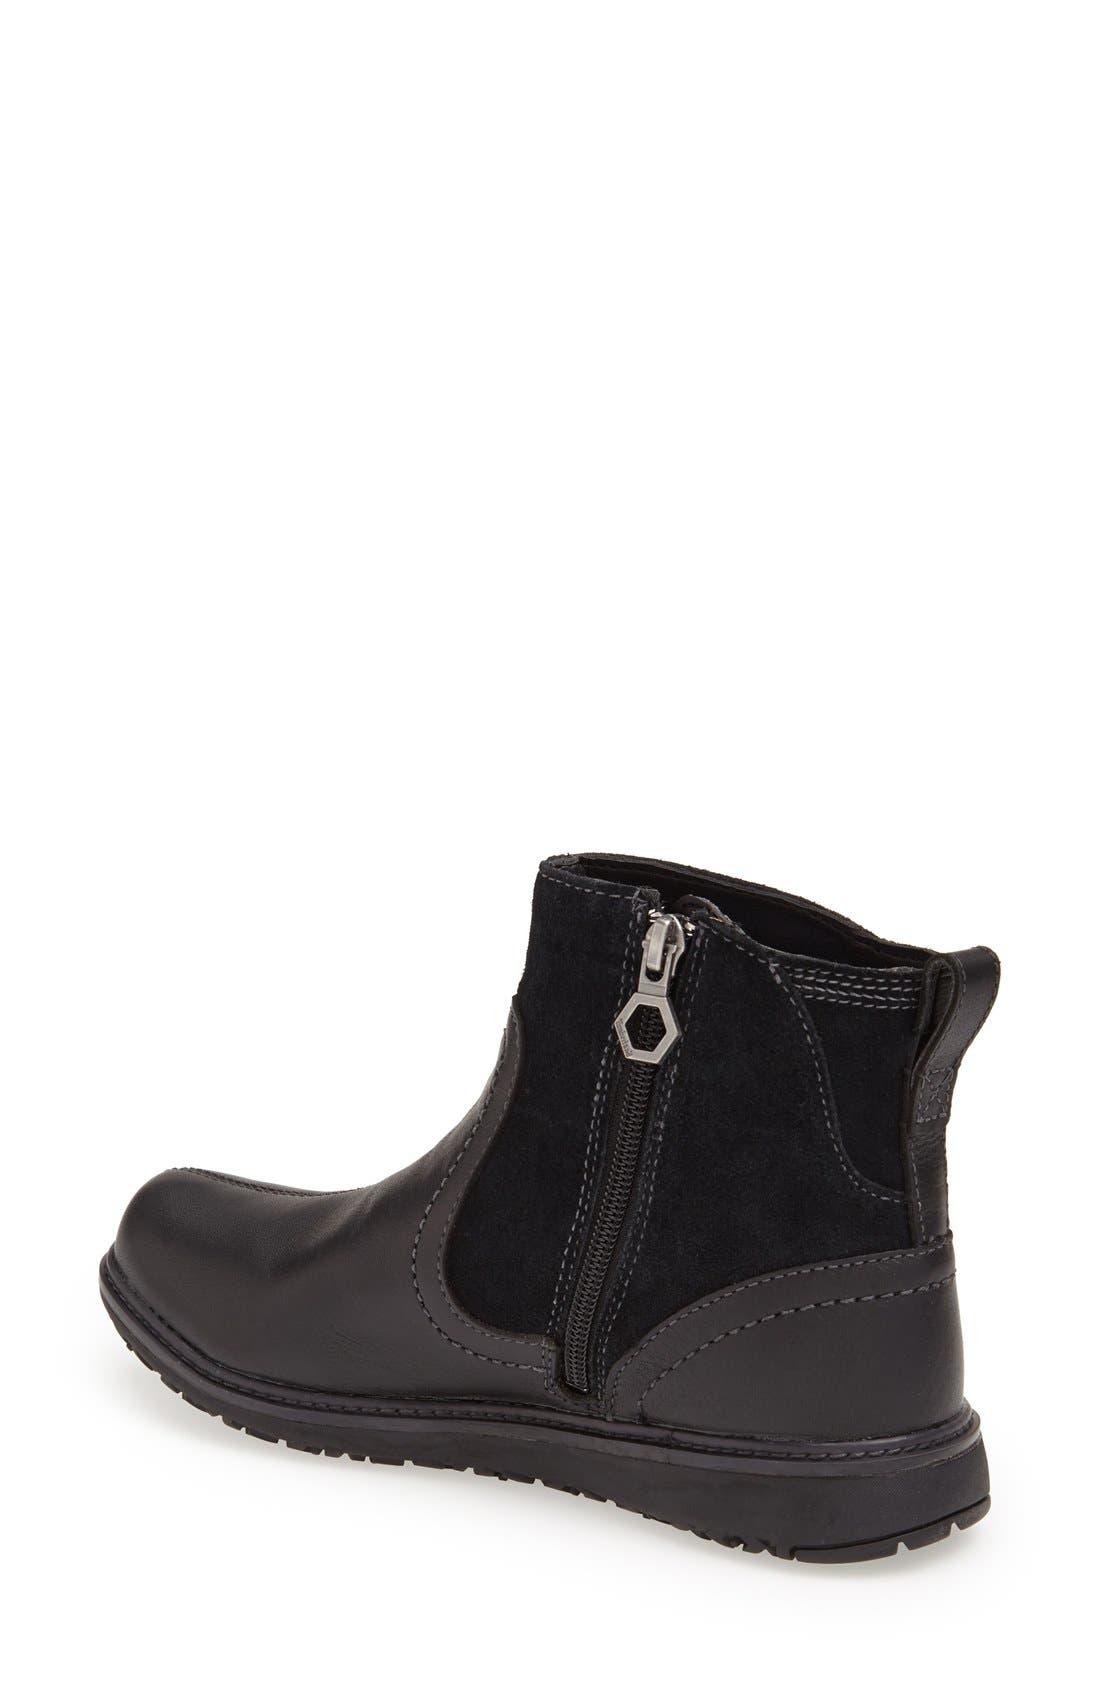 Alternate Image 2  - Timberland Earthkeepers® 'Ashdale' Waterproof Ankle Boot (Women)